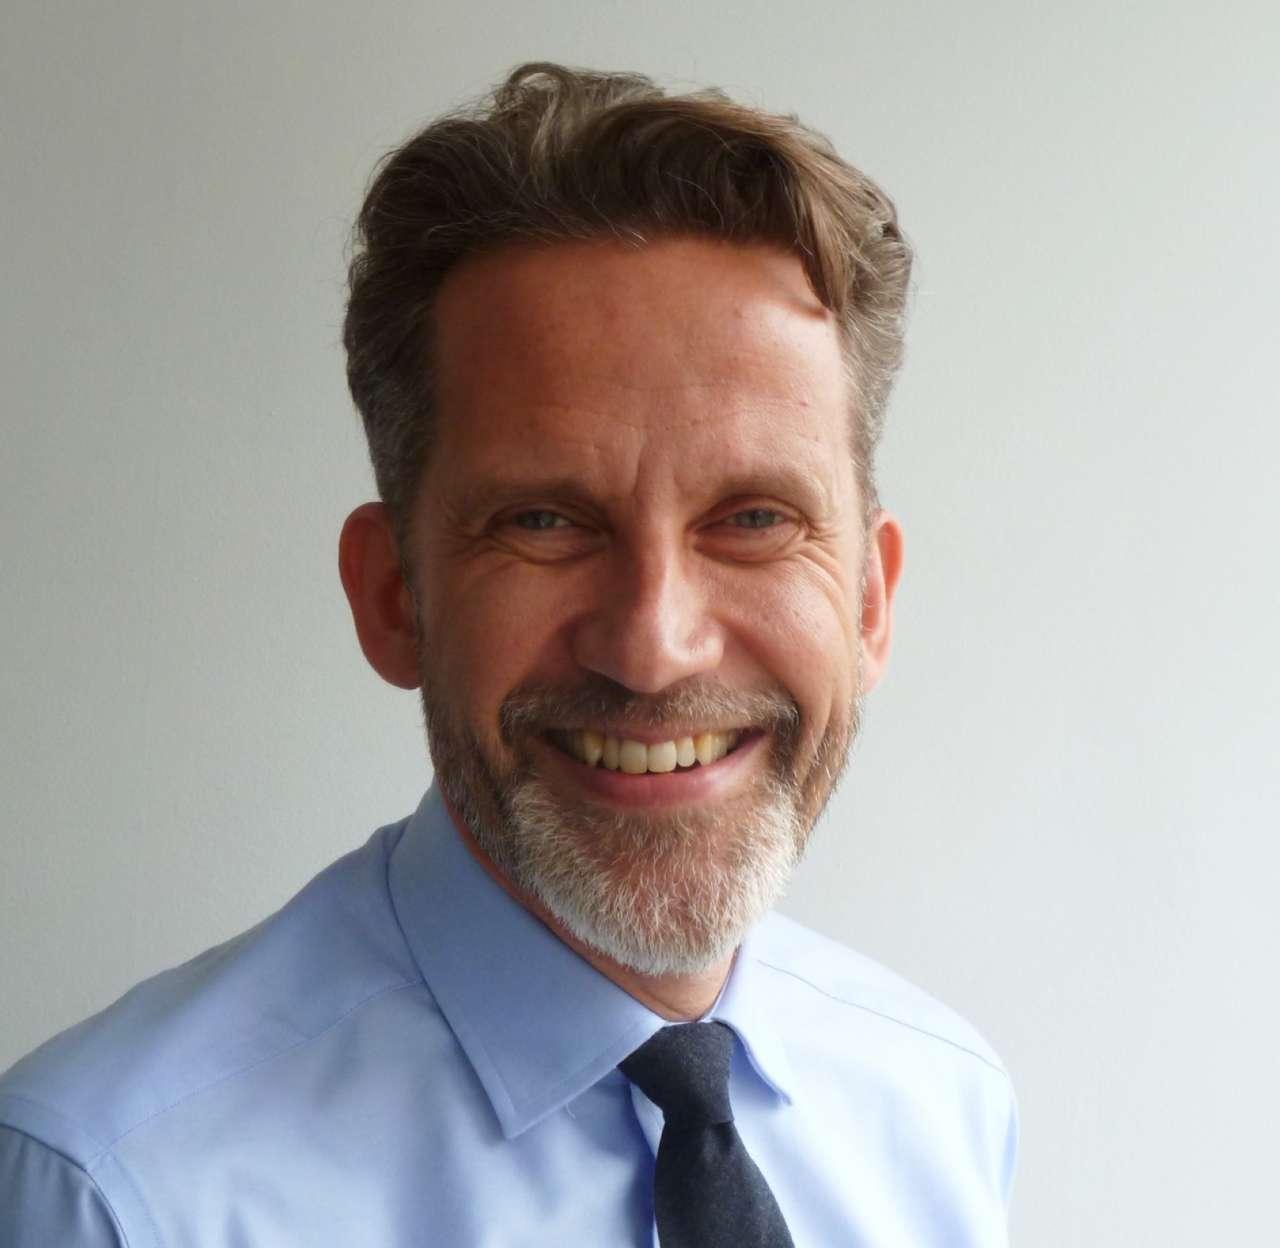 Stephen Richard's selected as guest speaker at the Melbourne Metro Rail Design Workshop